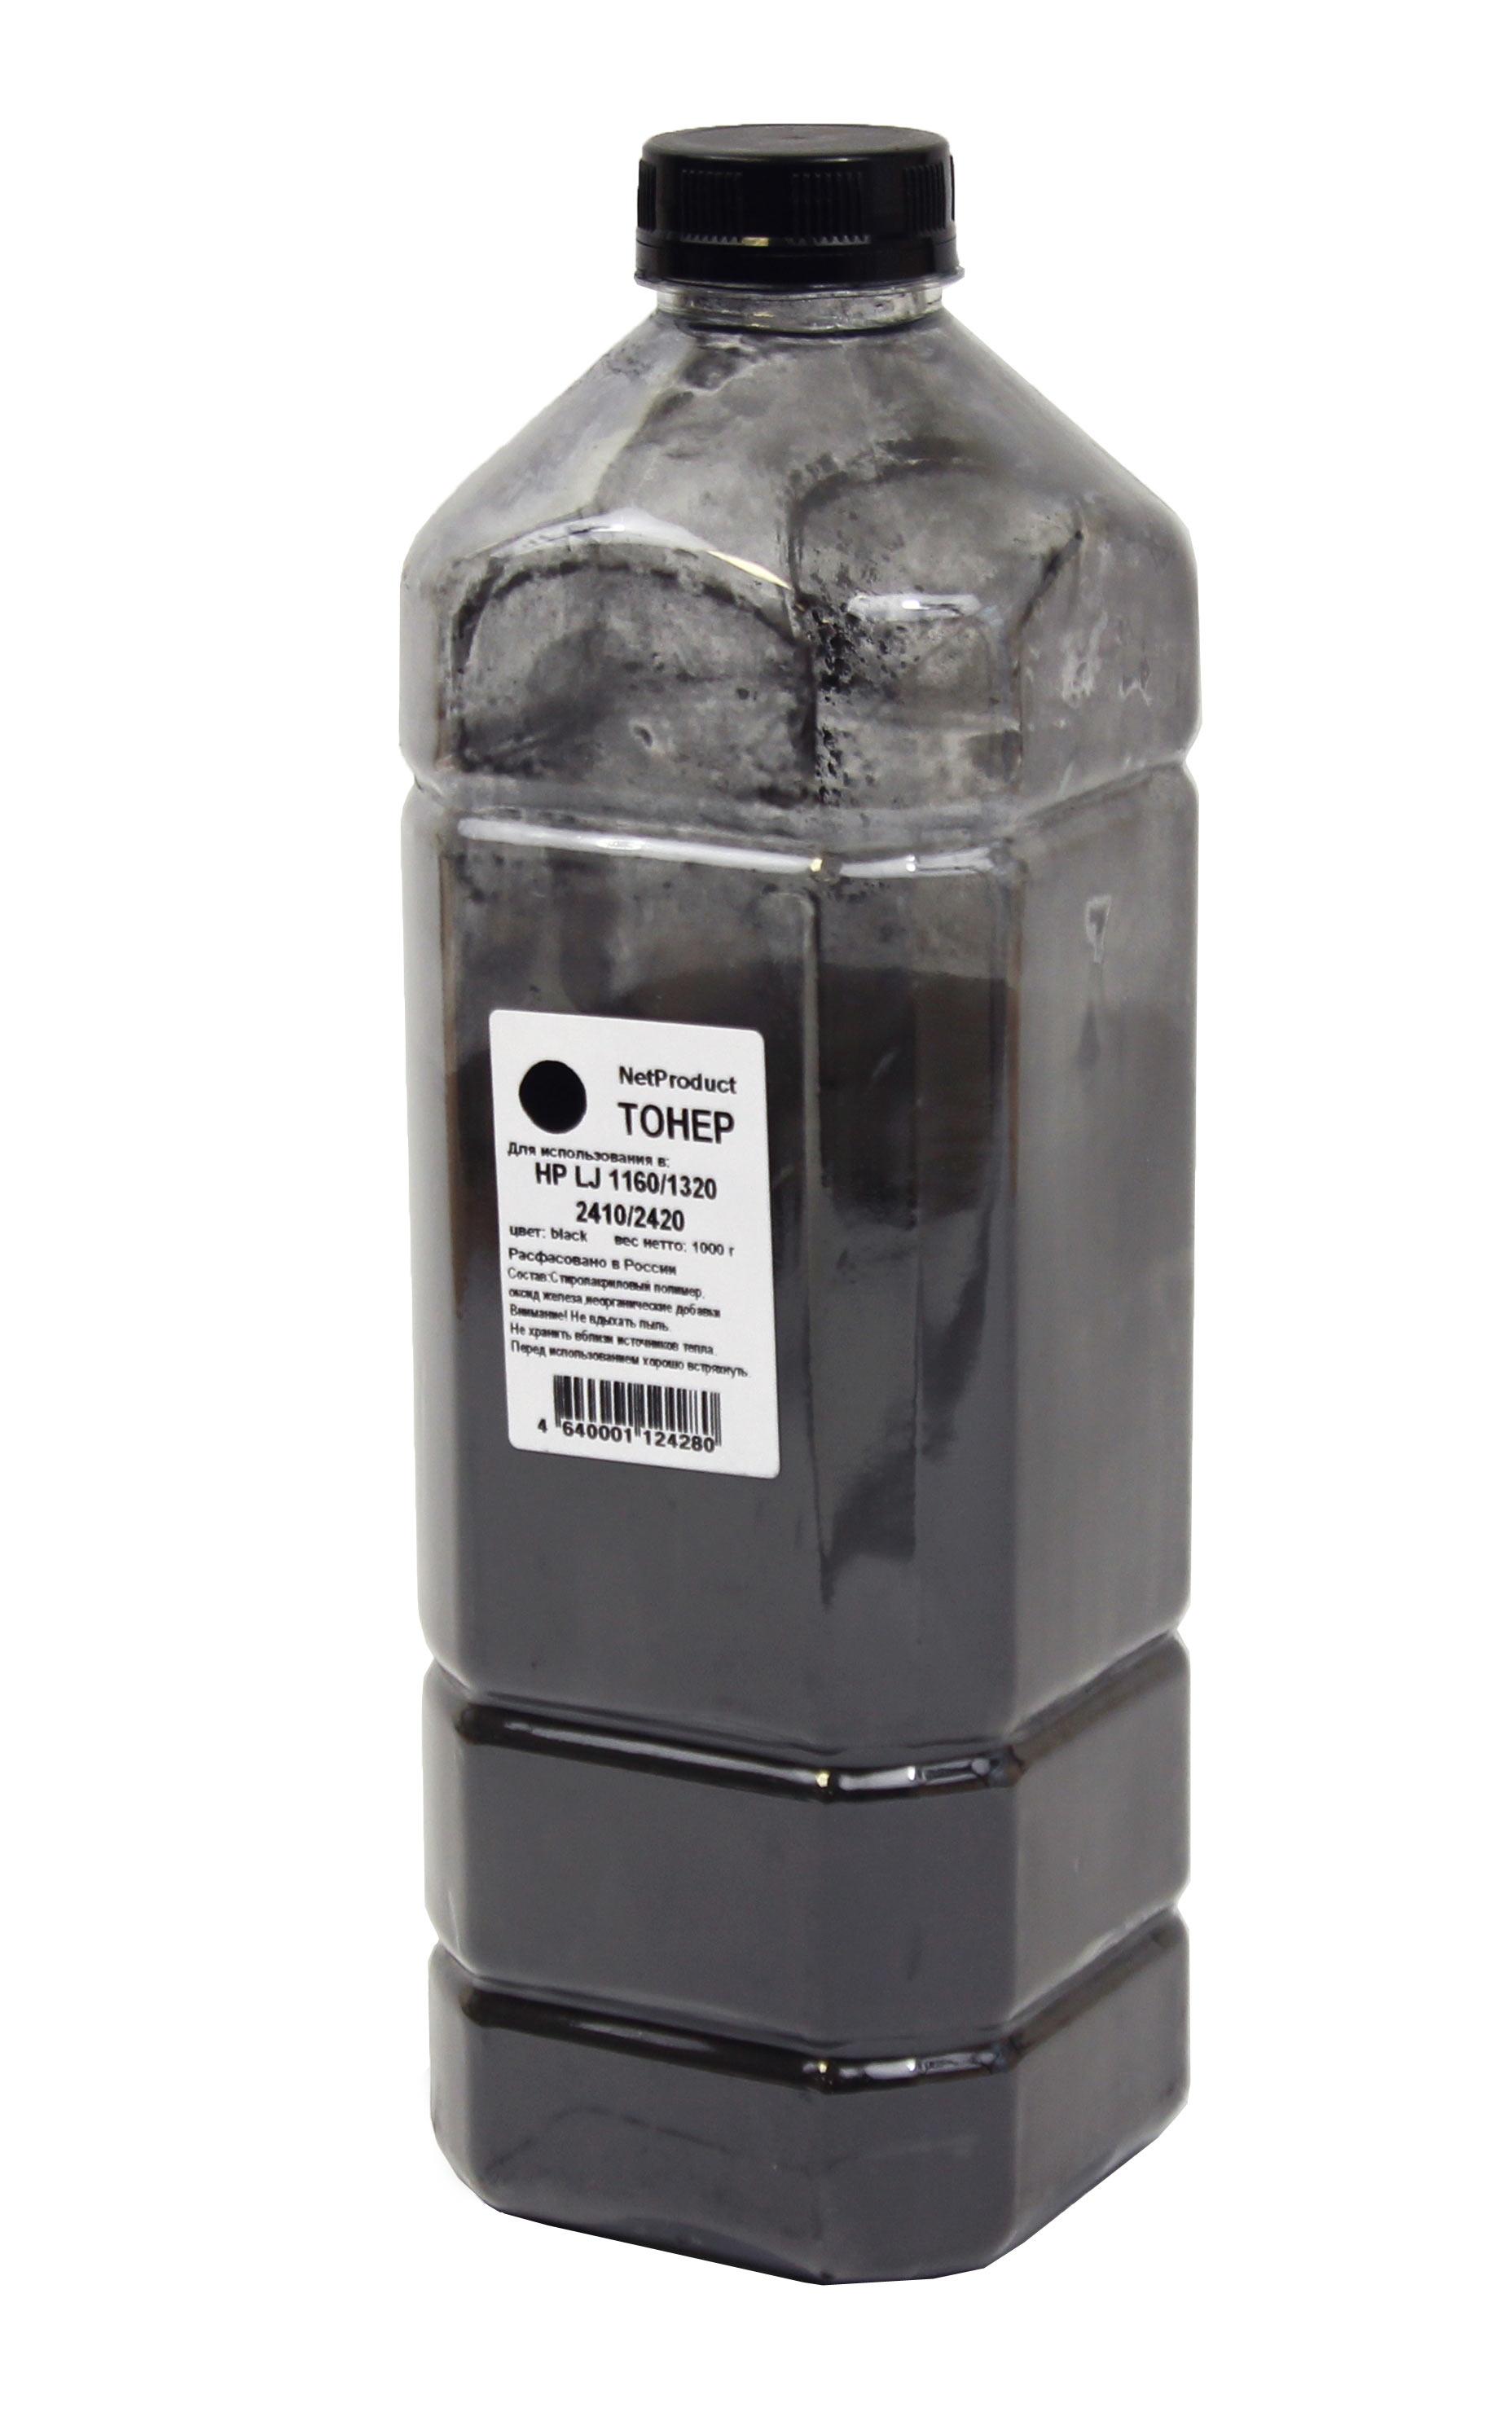 Тонер NetProduct для HP LJ 1160/1320/2410/2420, Bk, 1 кг, канистра